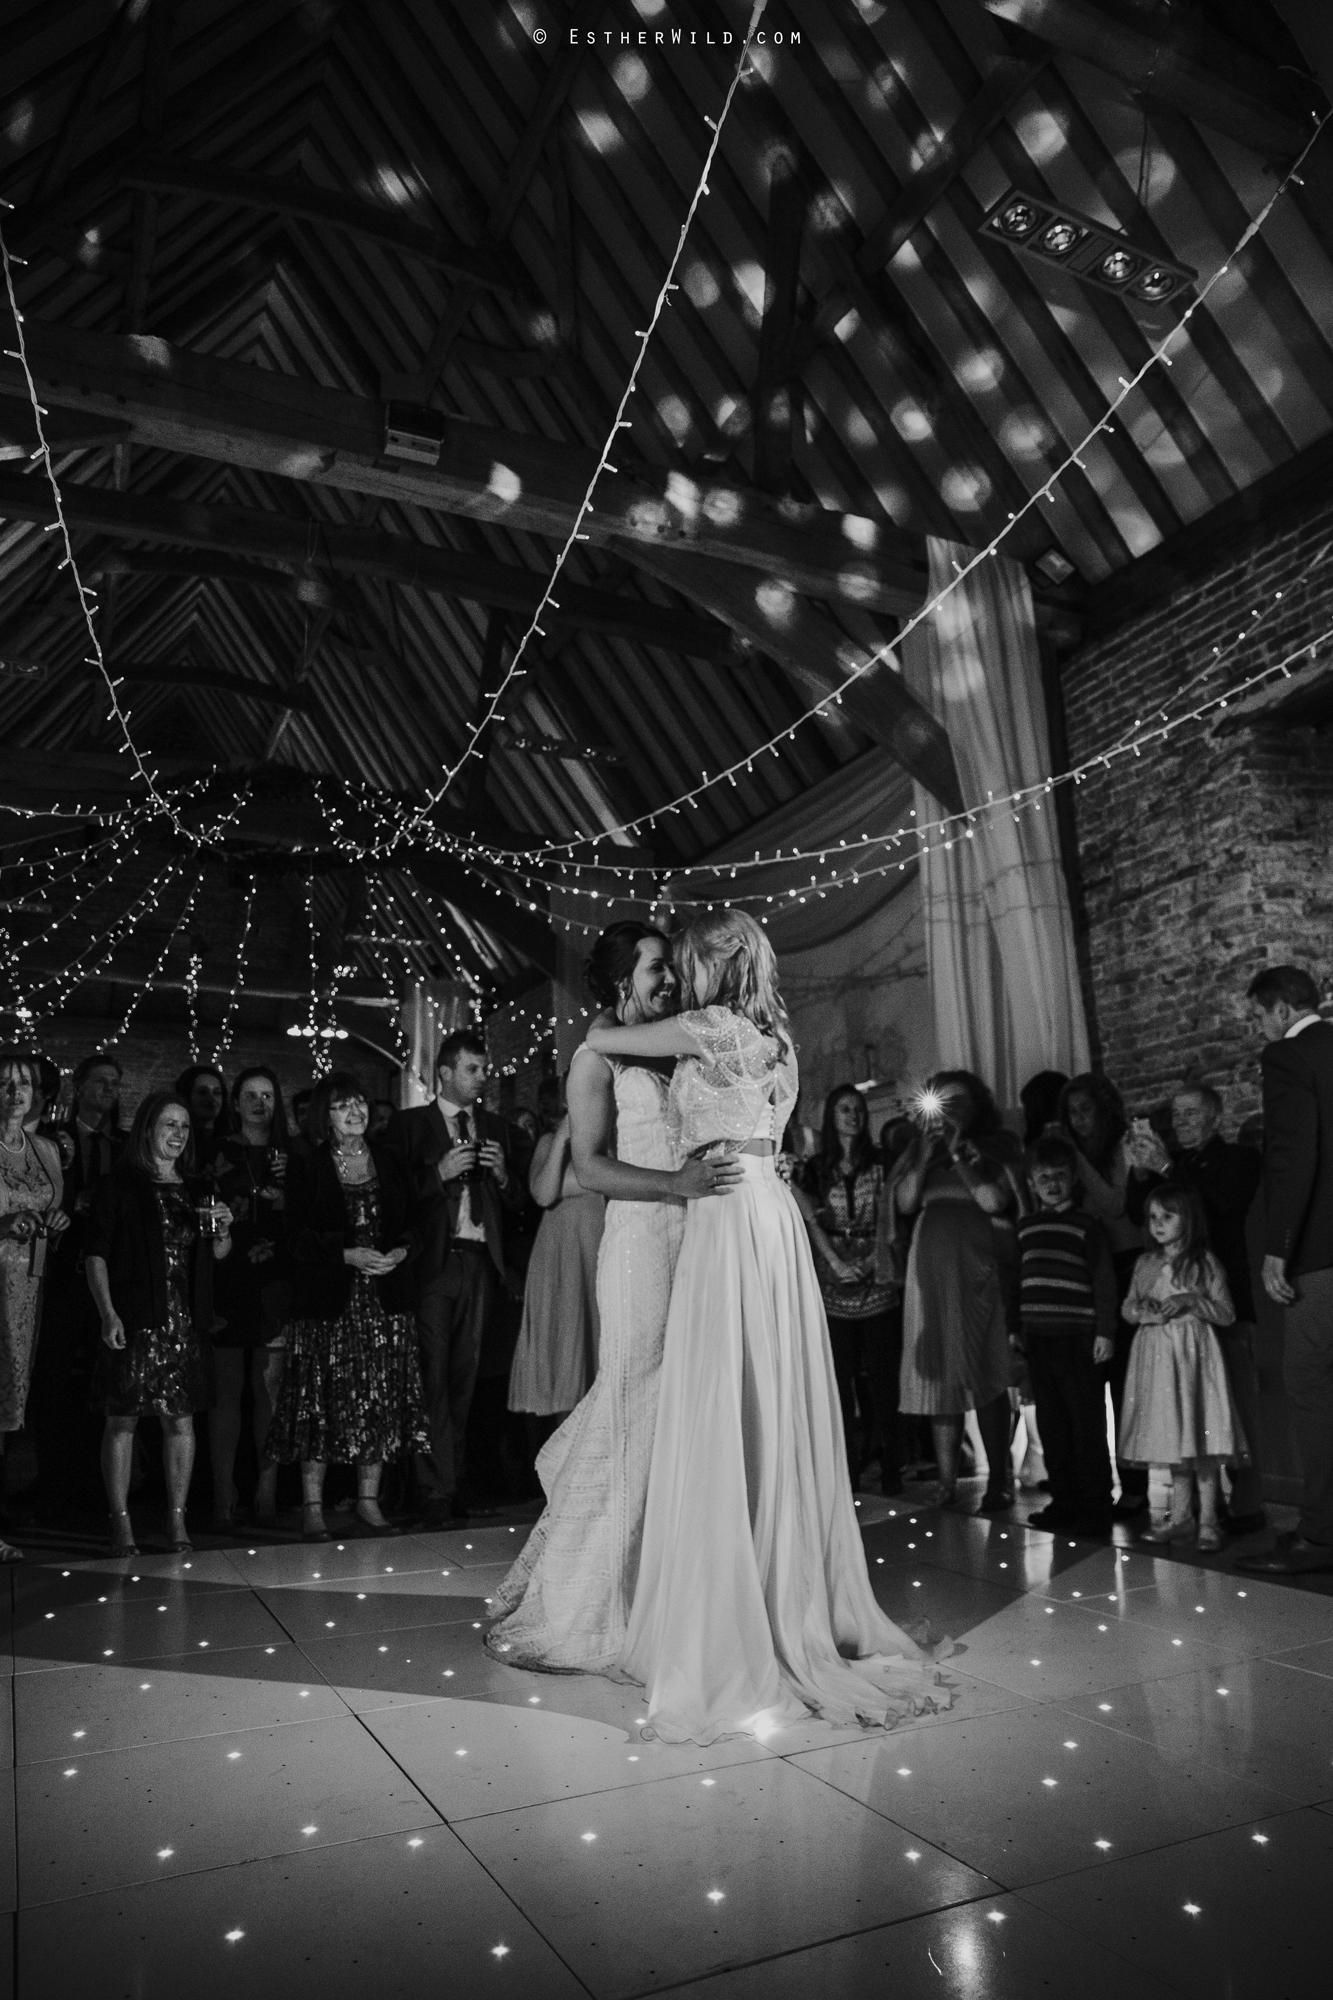 Elms_Barn_Weddings_Suffolk_Photographer_Copyright_Esther_Wild_IMG_3372-2.jpg